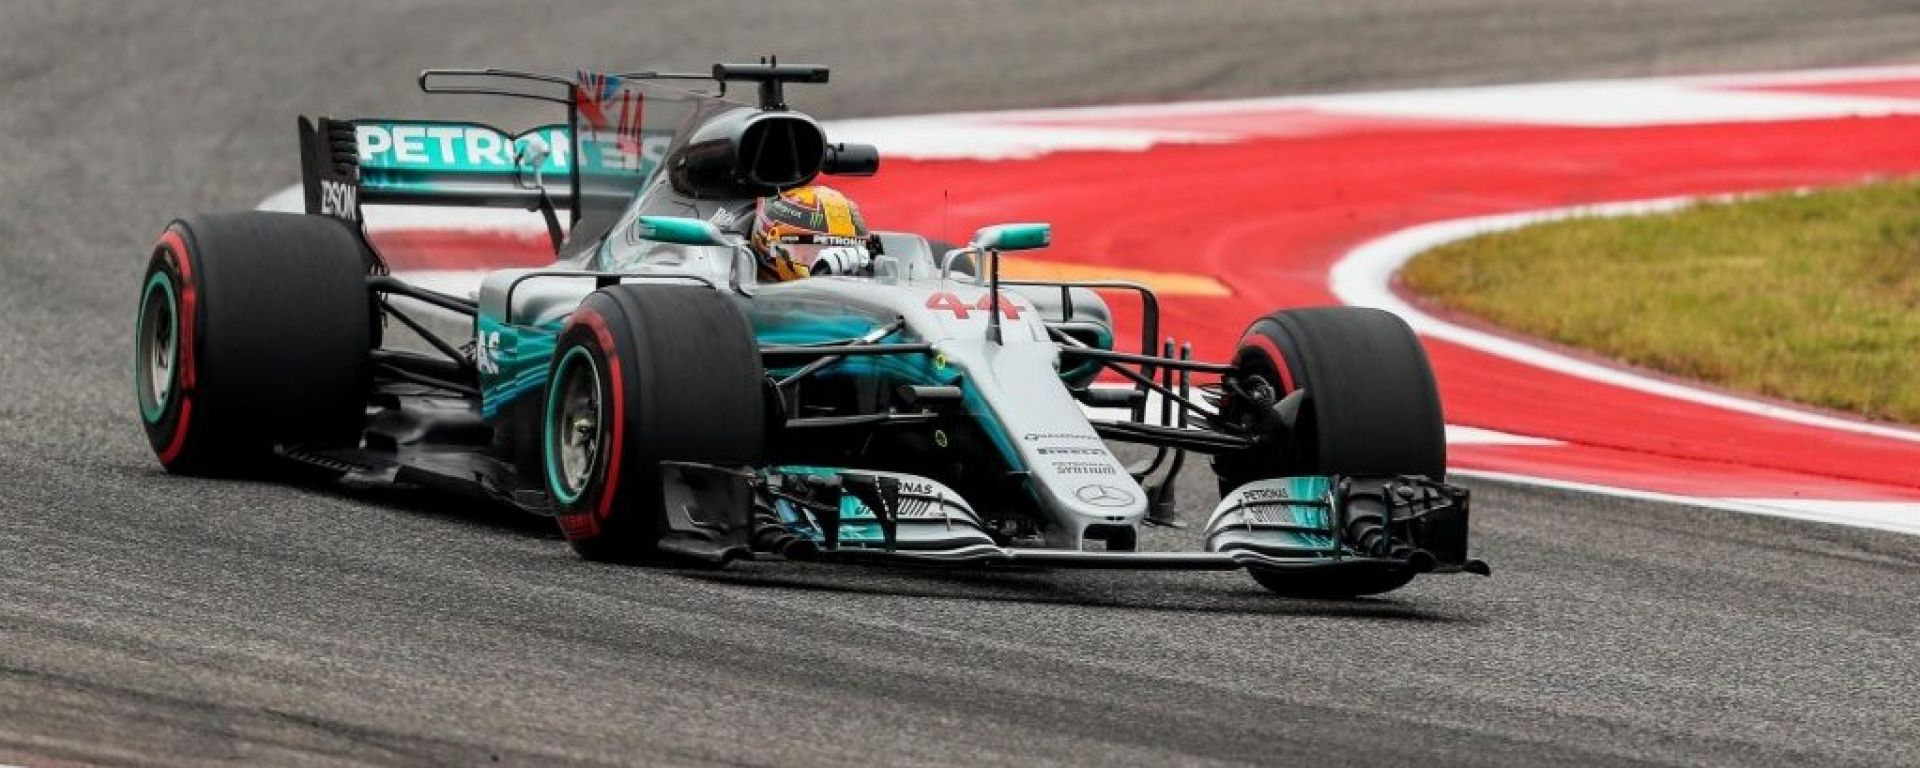 F1 2017 GP USA, Lewis Hamilton